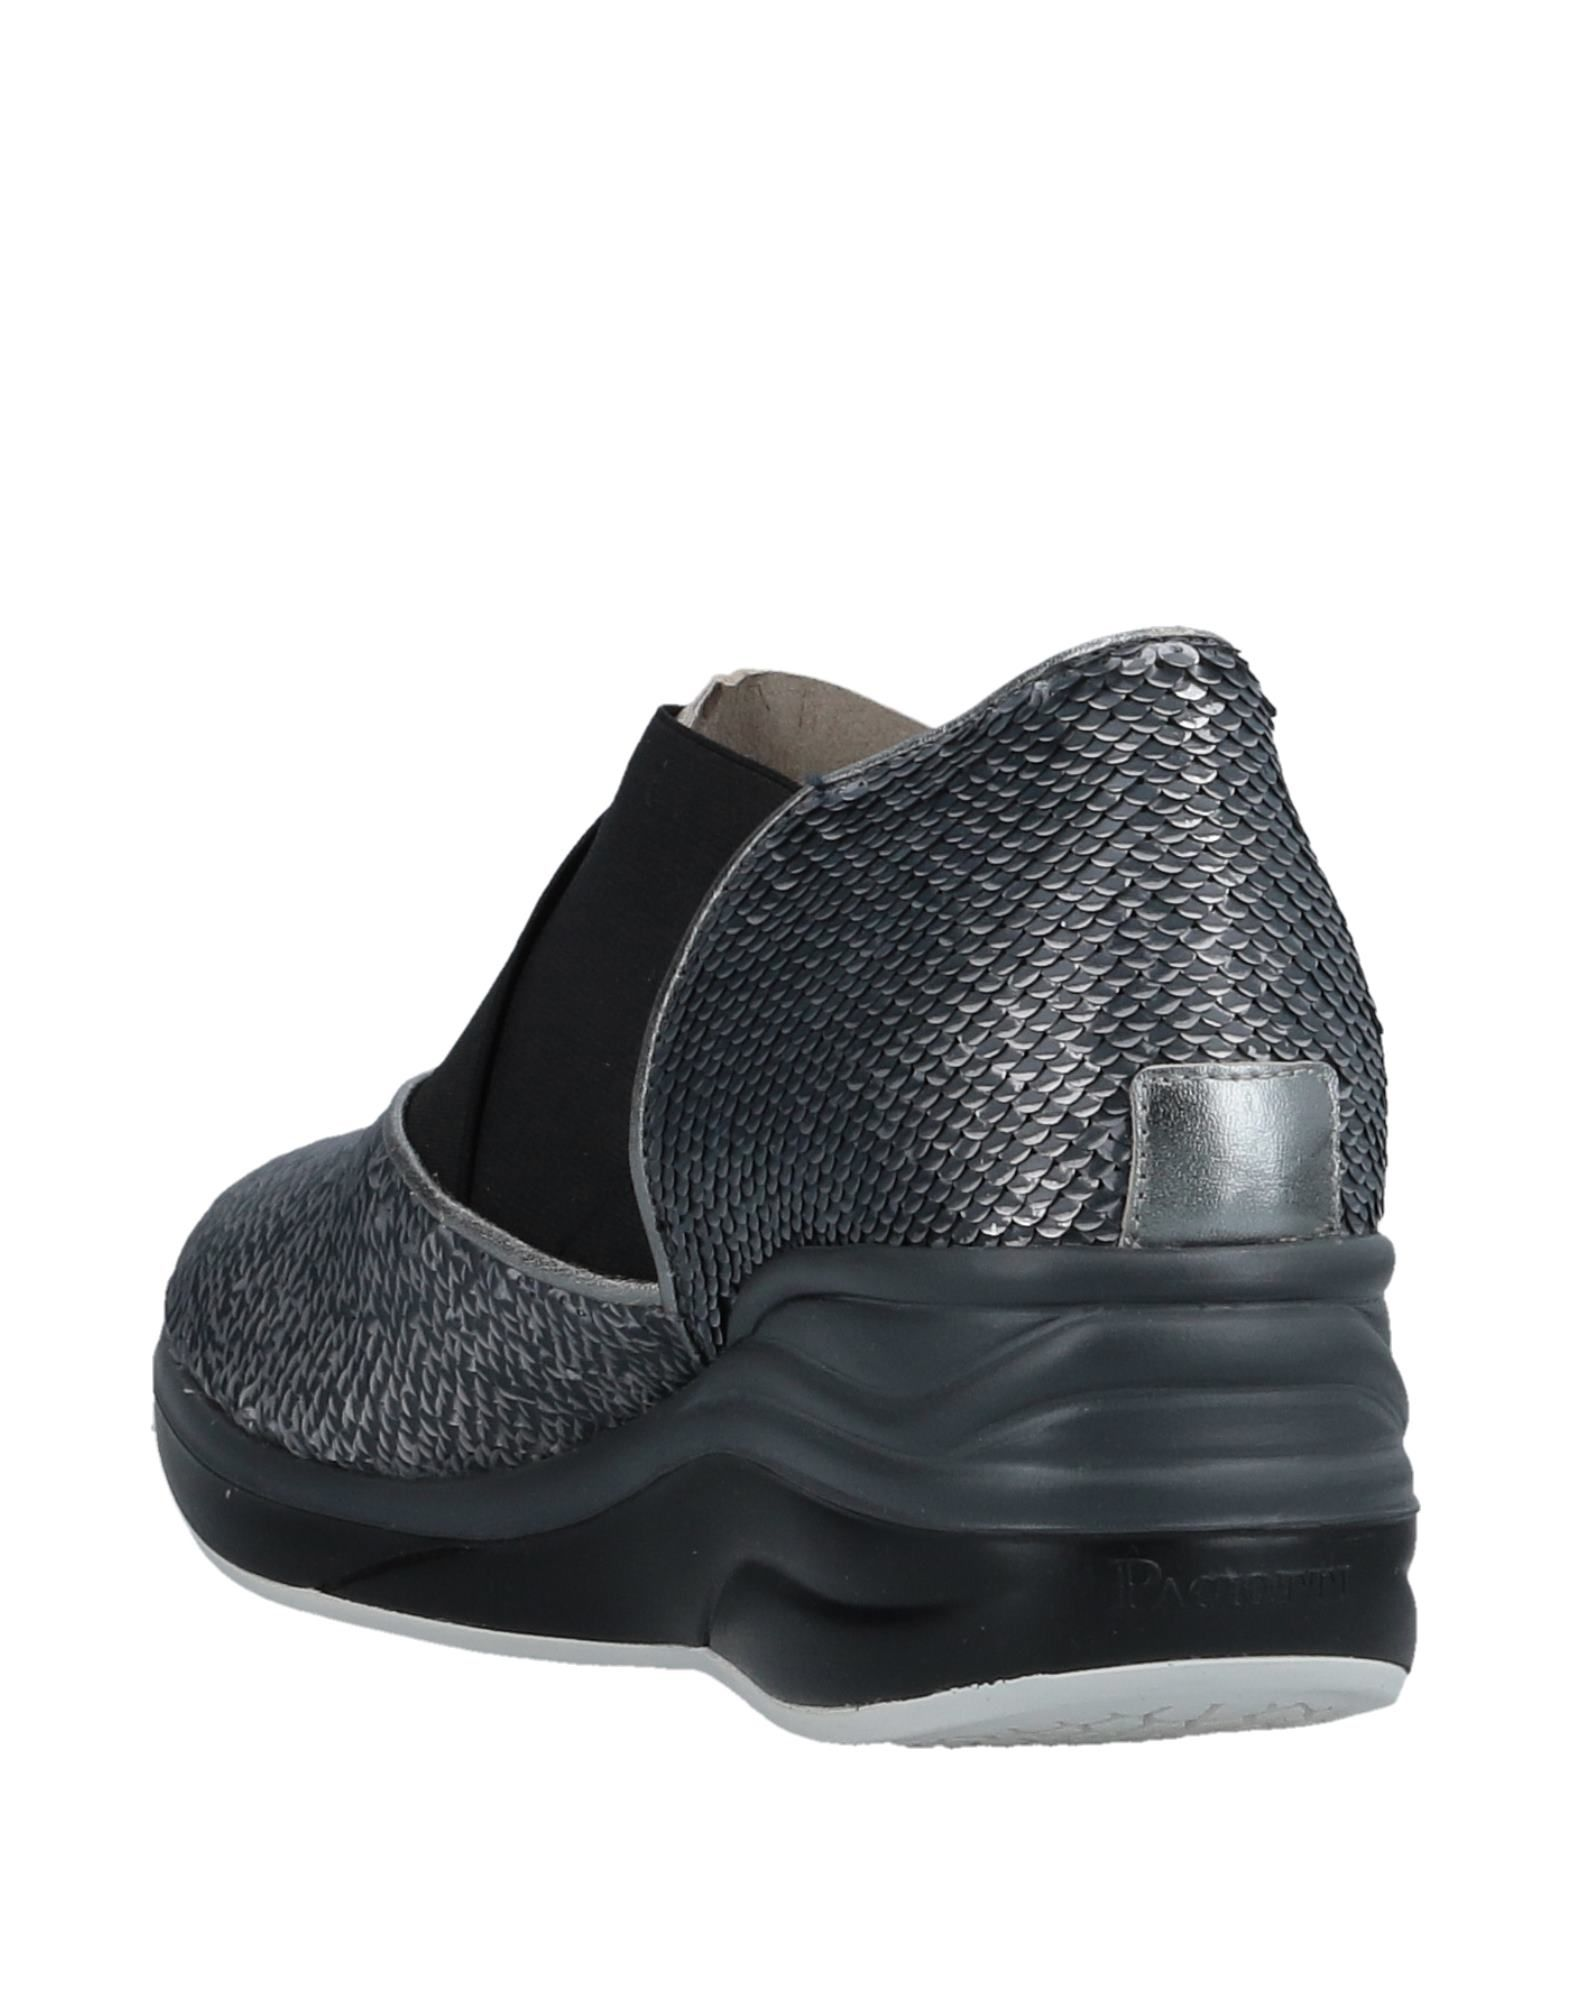 Cesare Paciotti 4Us Sneakers - - - Women Cesare Paciotti 4Us Sneakers online on  United Kingdom - 11509372RB d8cbc9